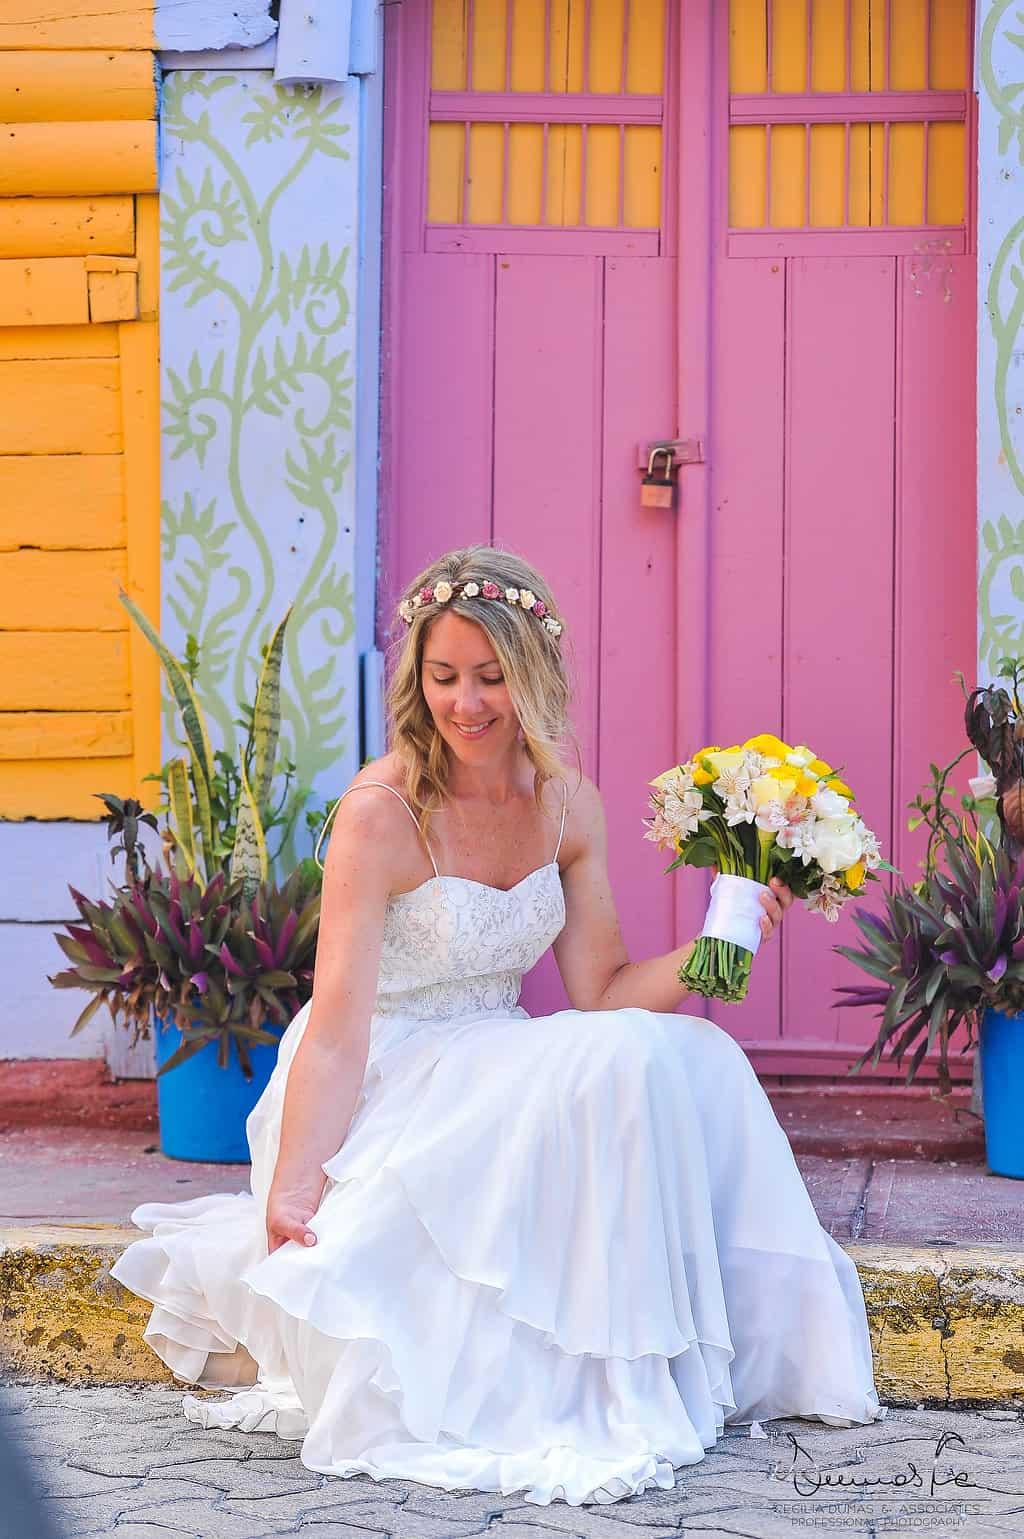 islamujeres-buhos-weddingphotography-heathermel31